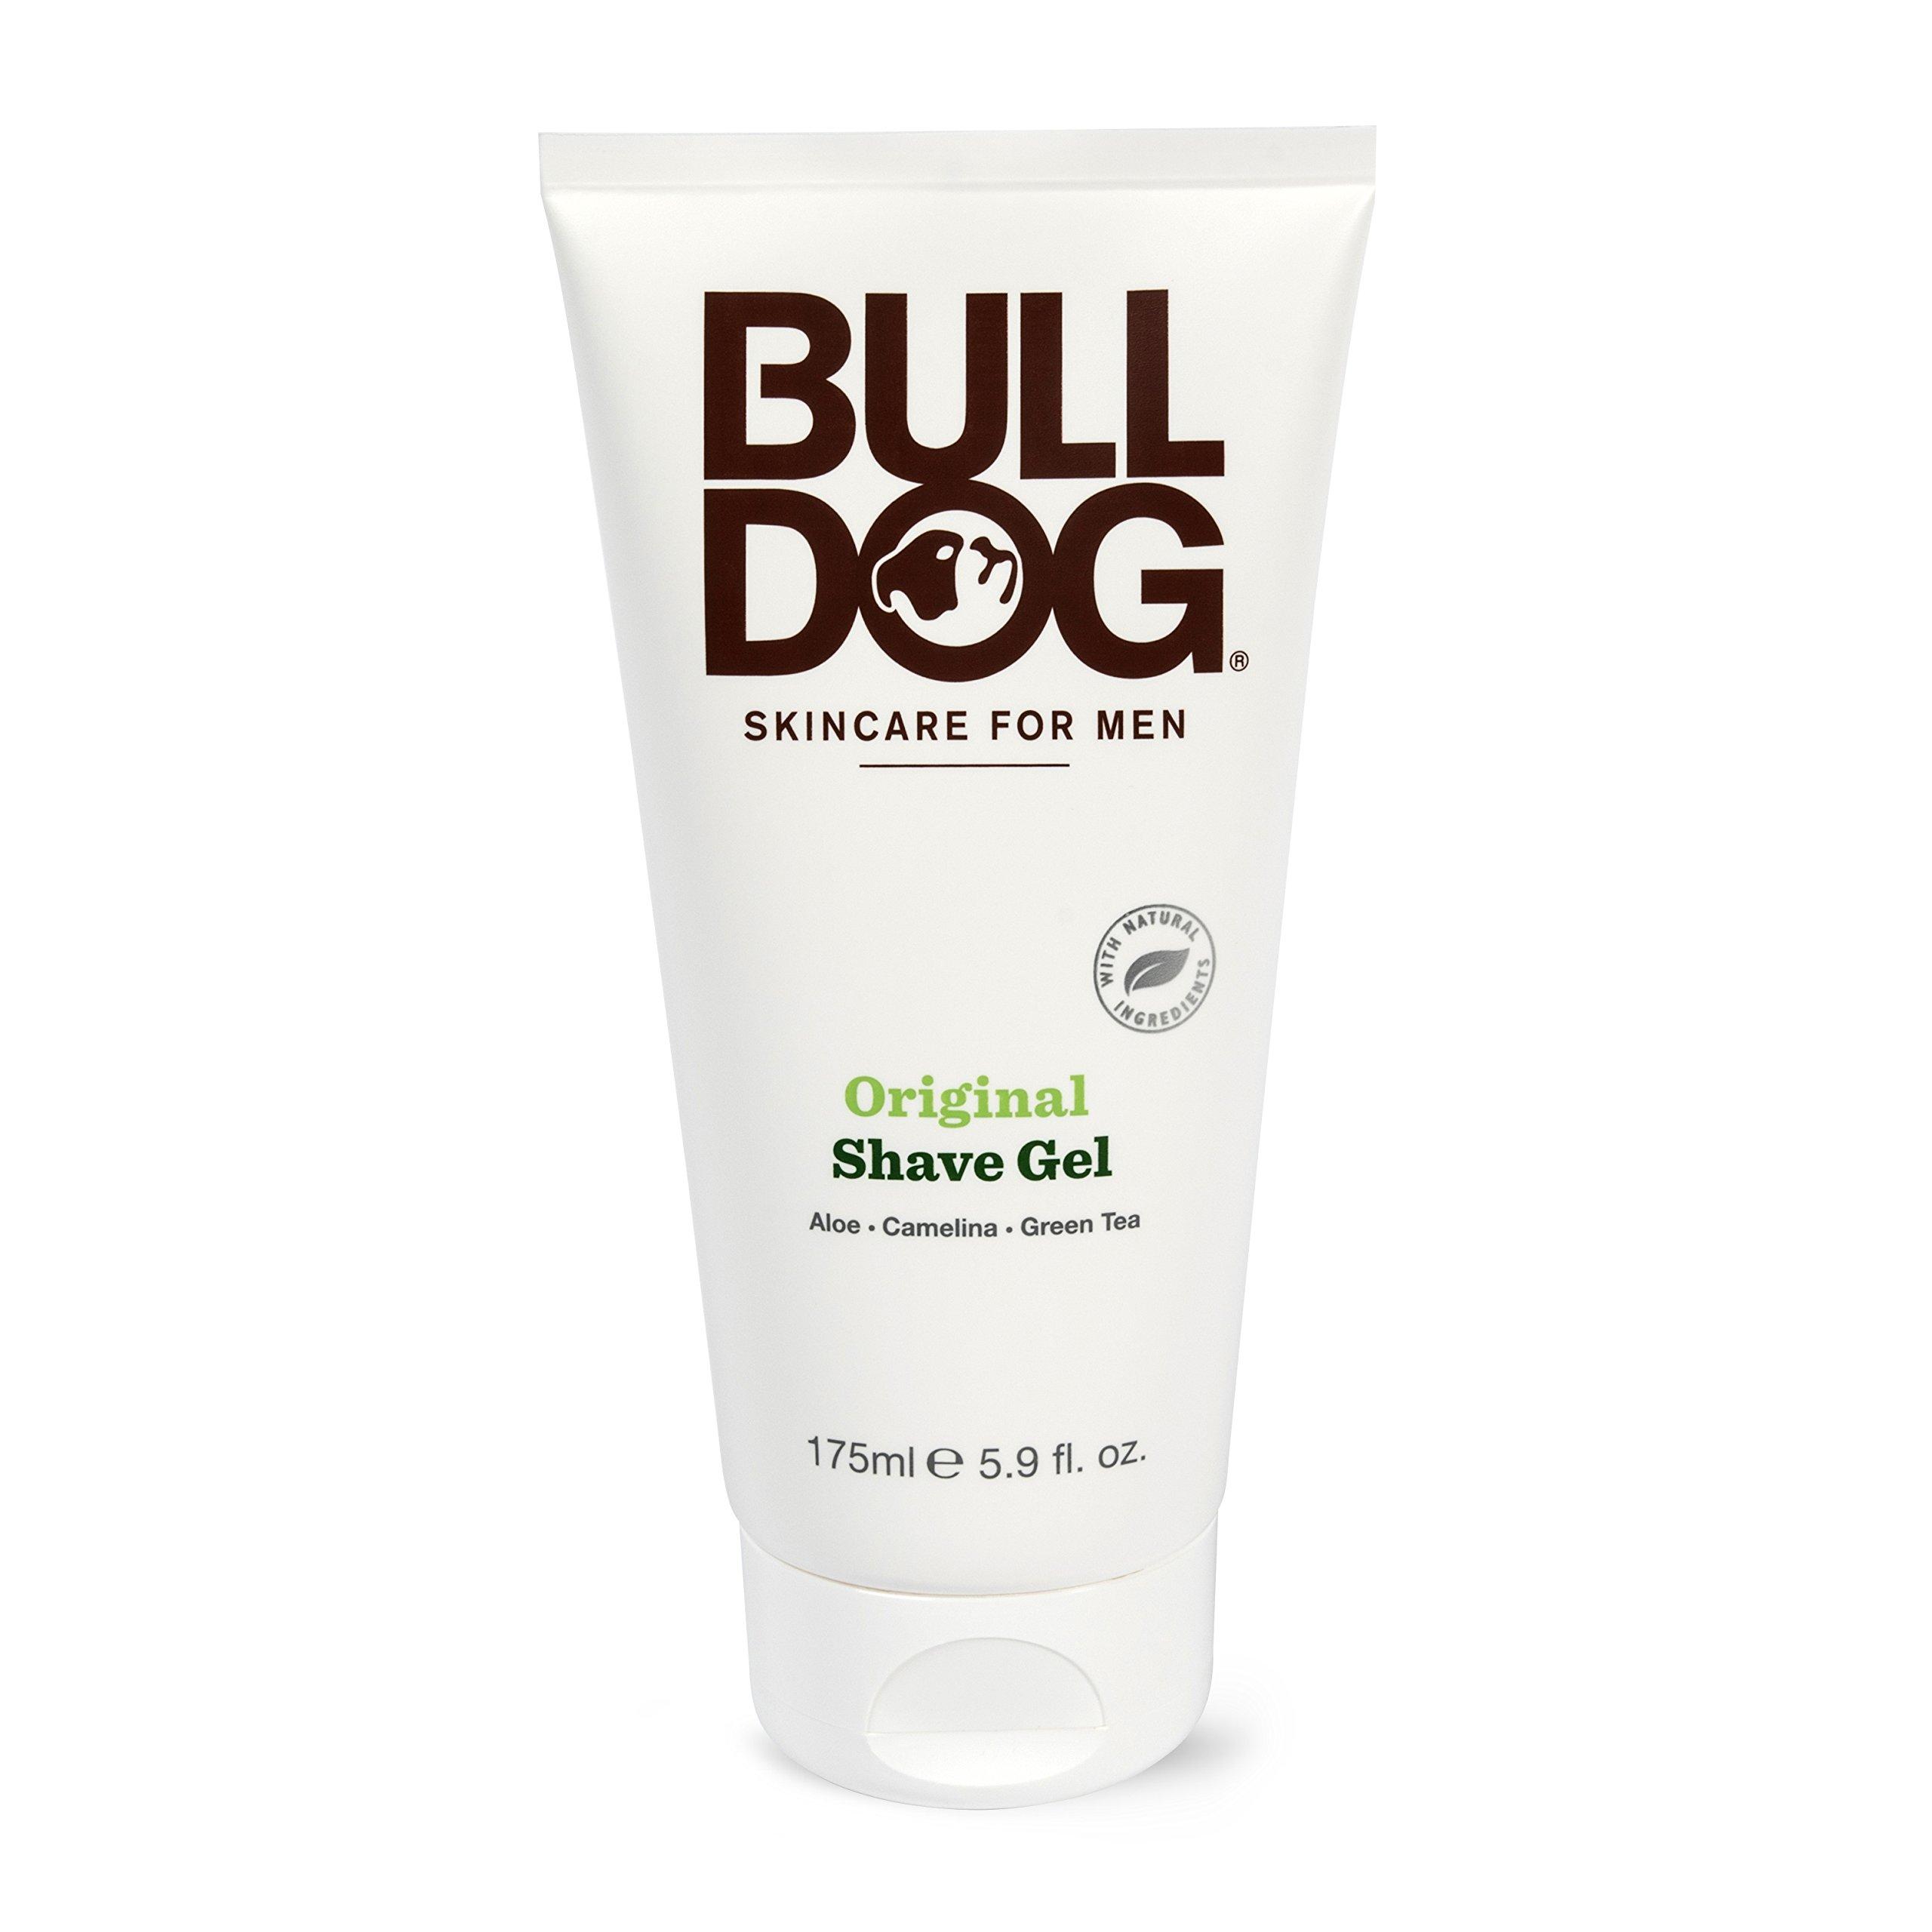 Bulldog Skincare and Grooming For Men Original Shave Gel, 5.9 Ounce